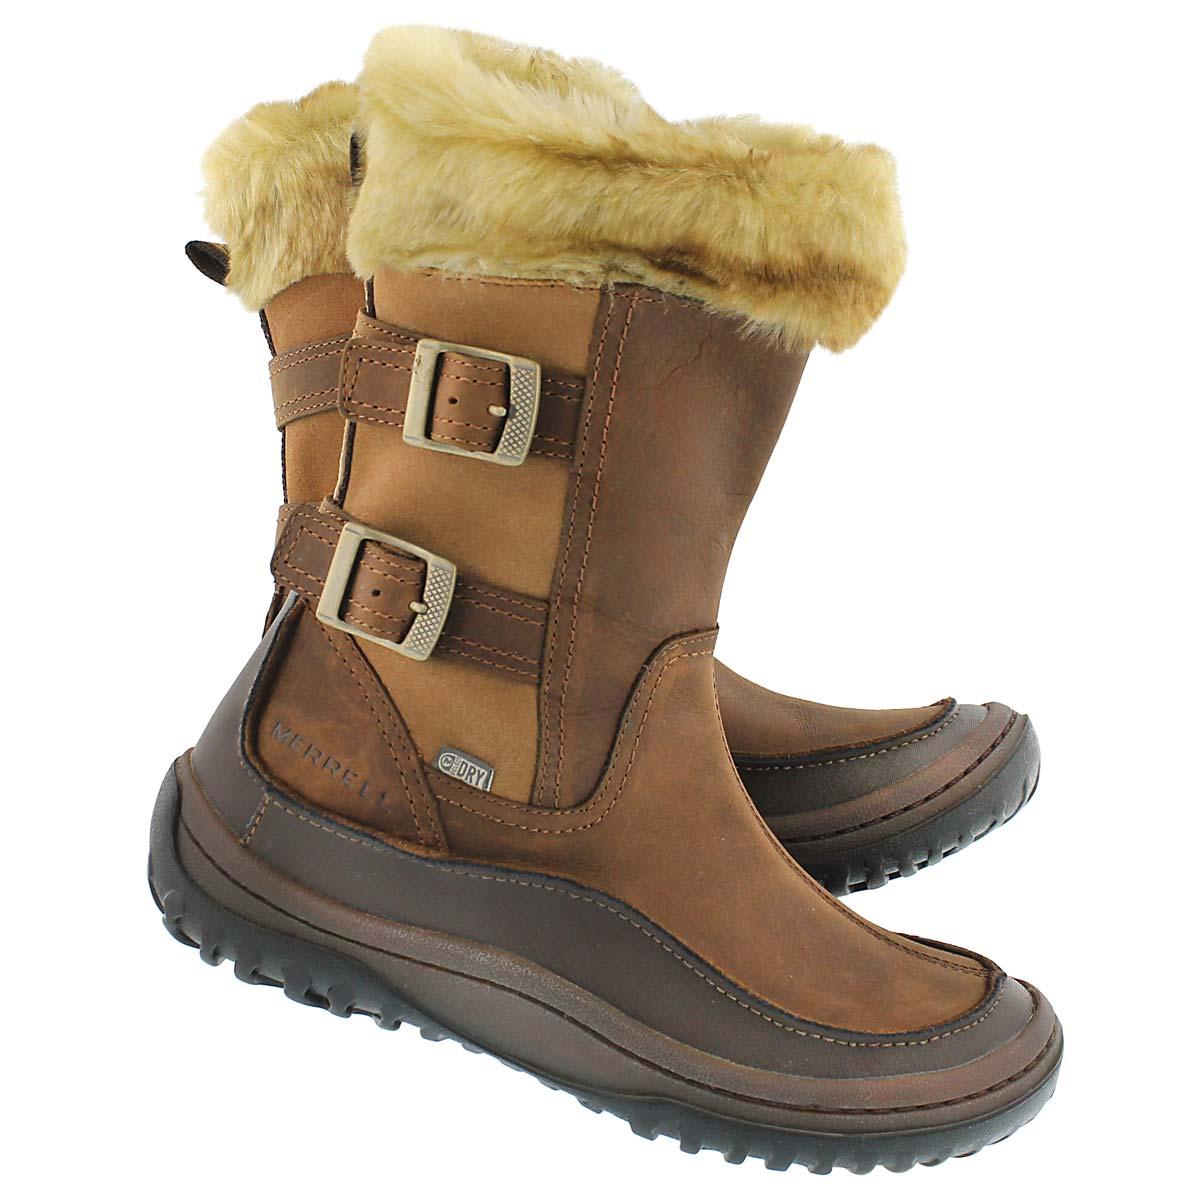 Lds Chant brn sugar wtrpf winter boot